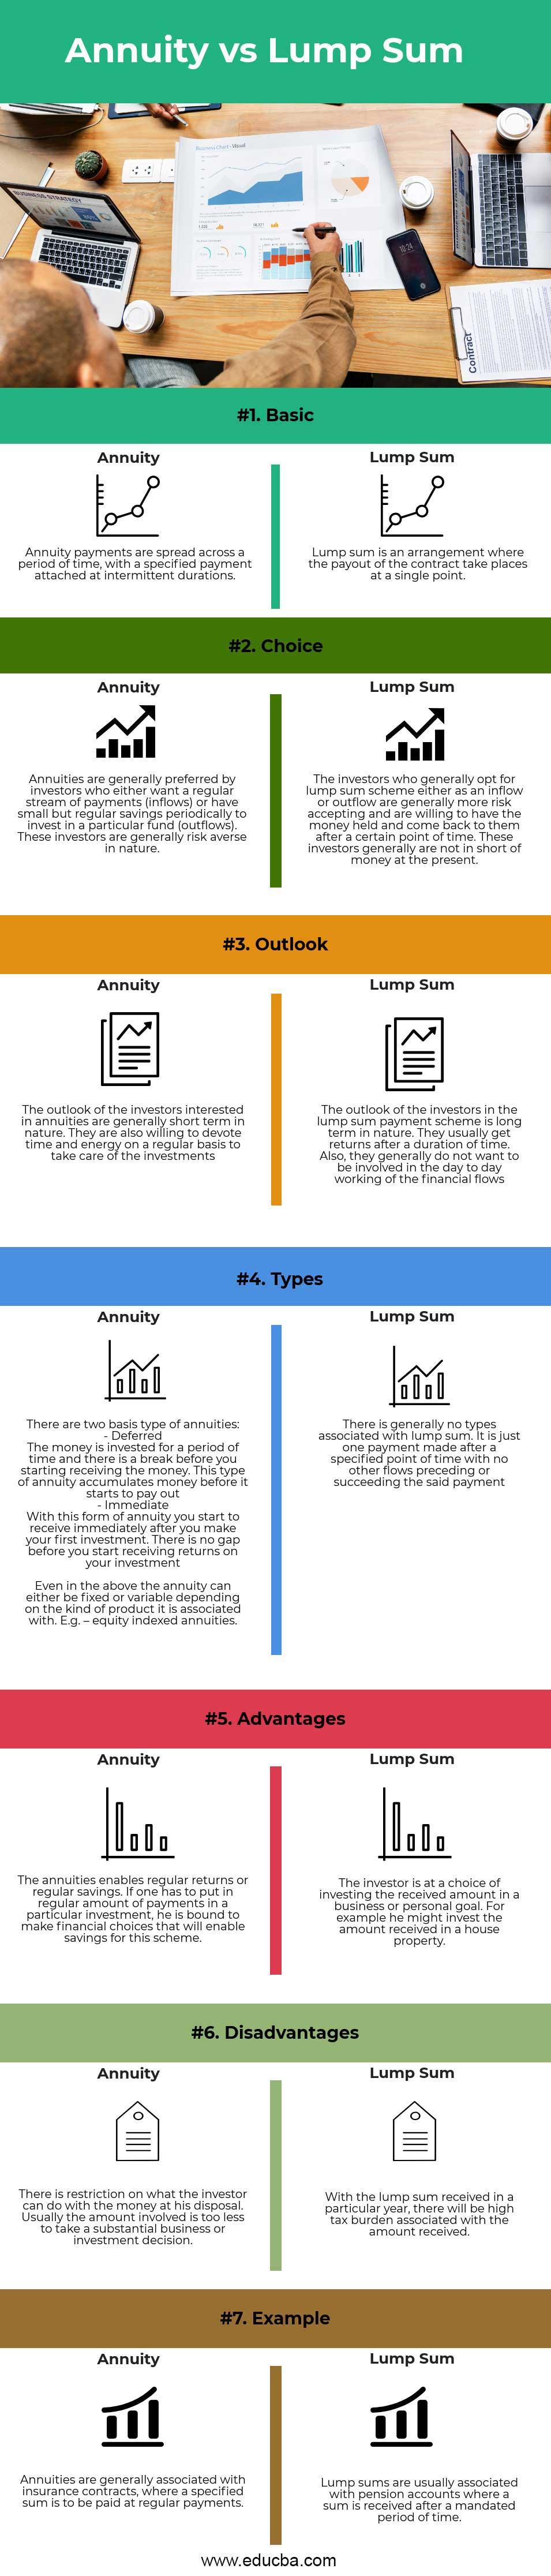 Annuity vs Lump Sum info